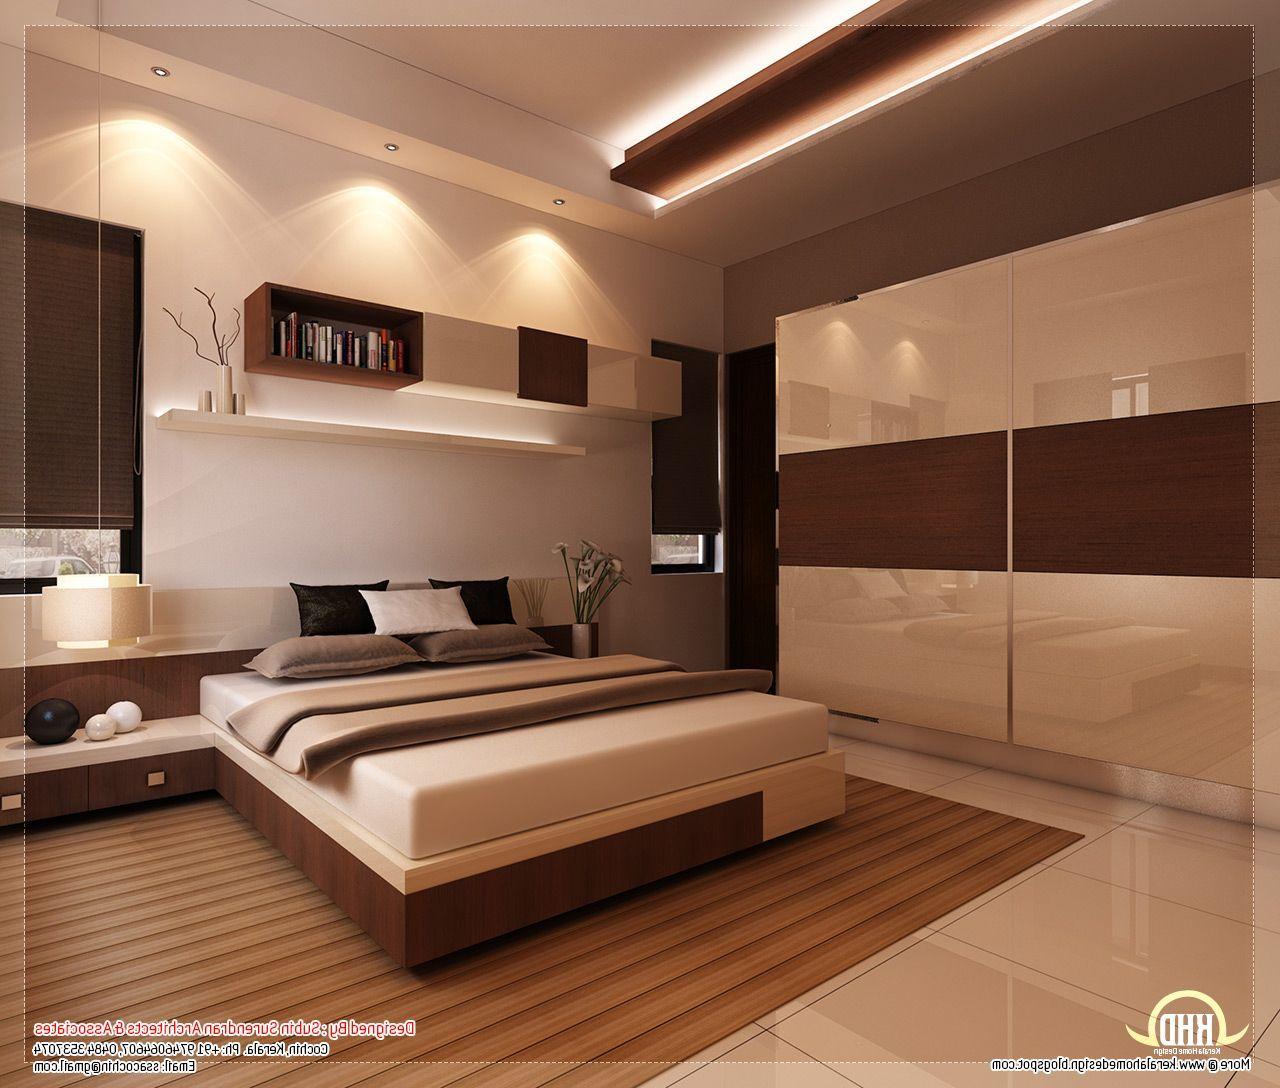 Icymi kerala house bedrooms luxurybedroomdesignsinindia also stylish rh pinterest